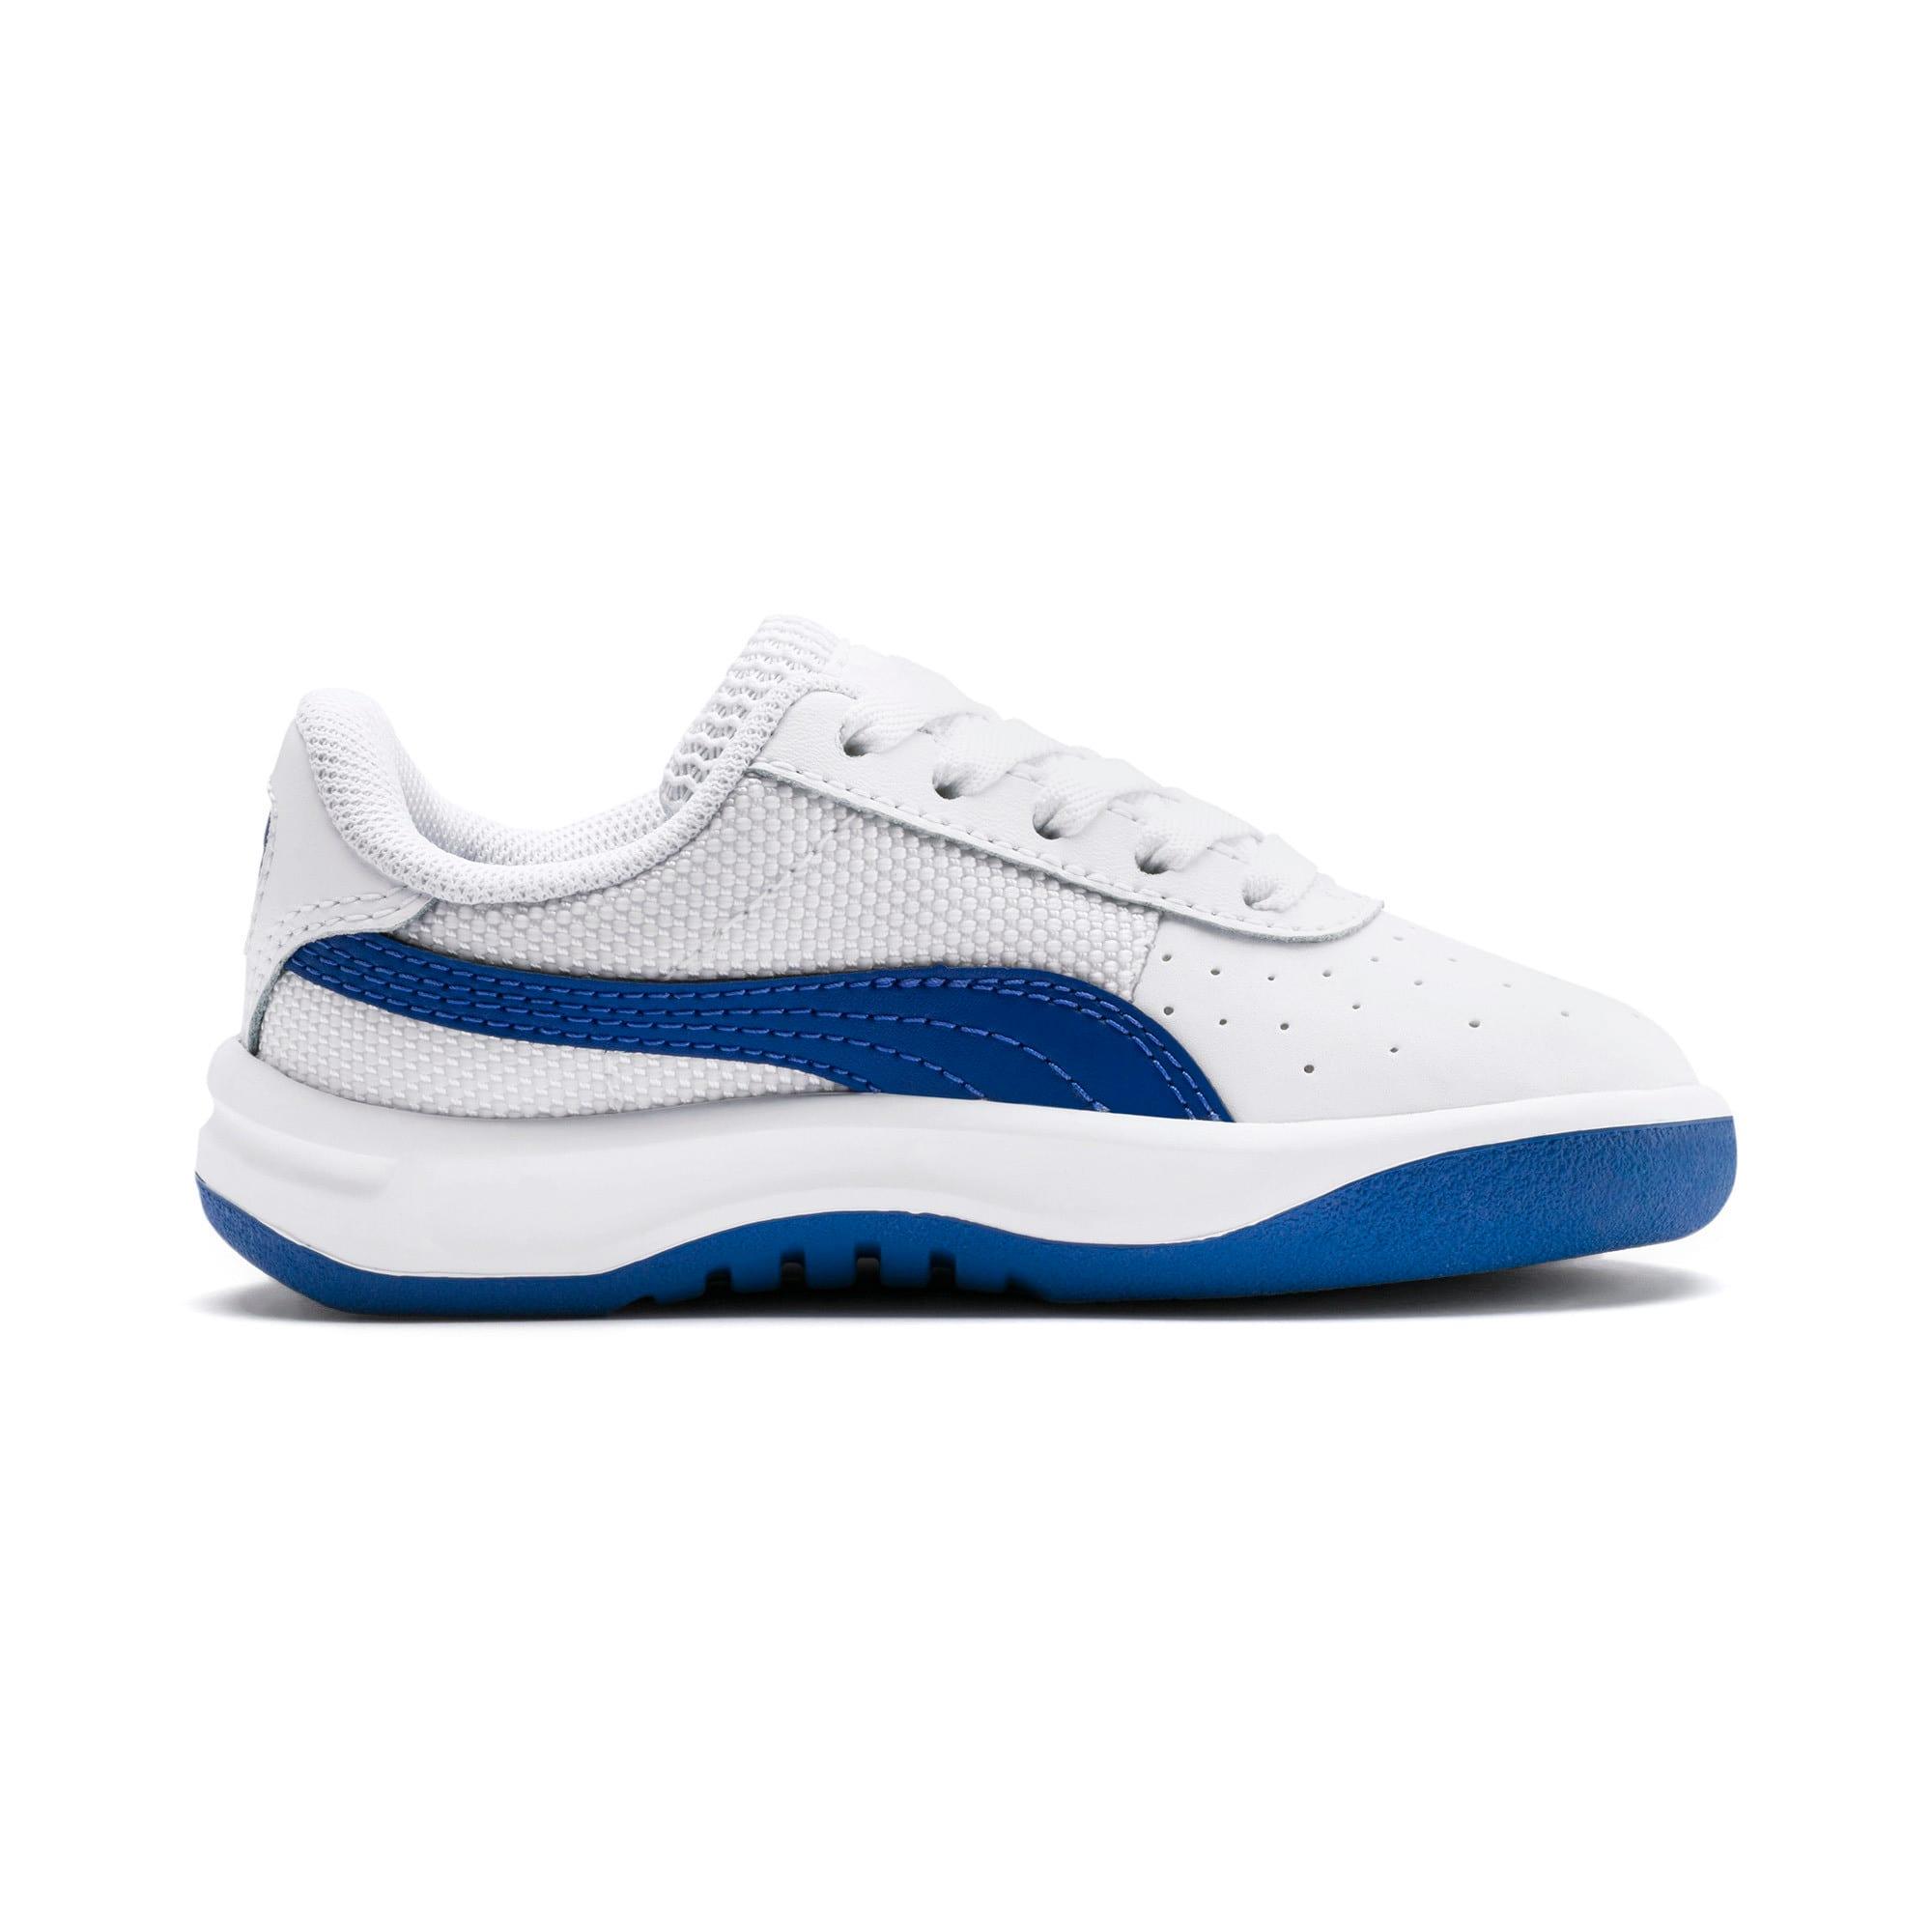 Thumbnail 5 of California Toddler Shoes, Puma White-Galaxy Blue, medium